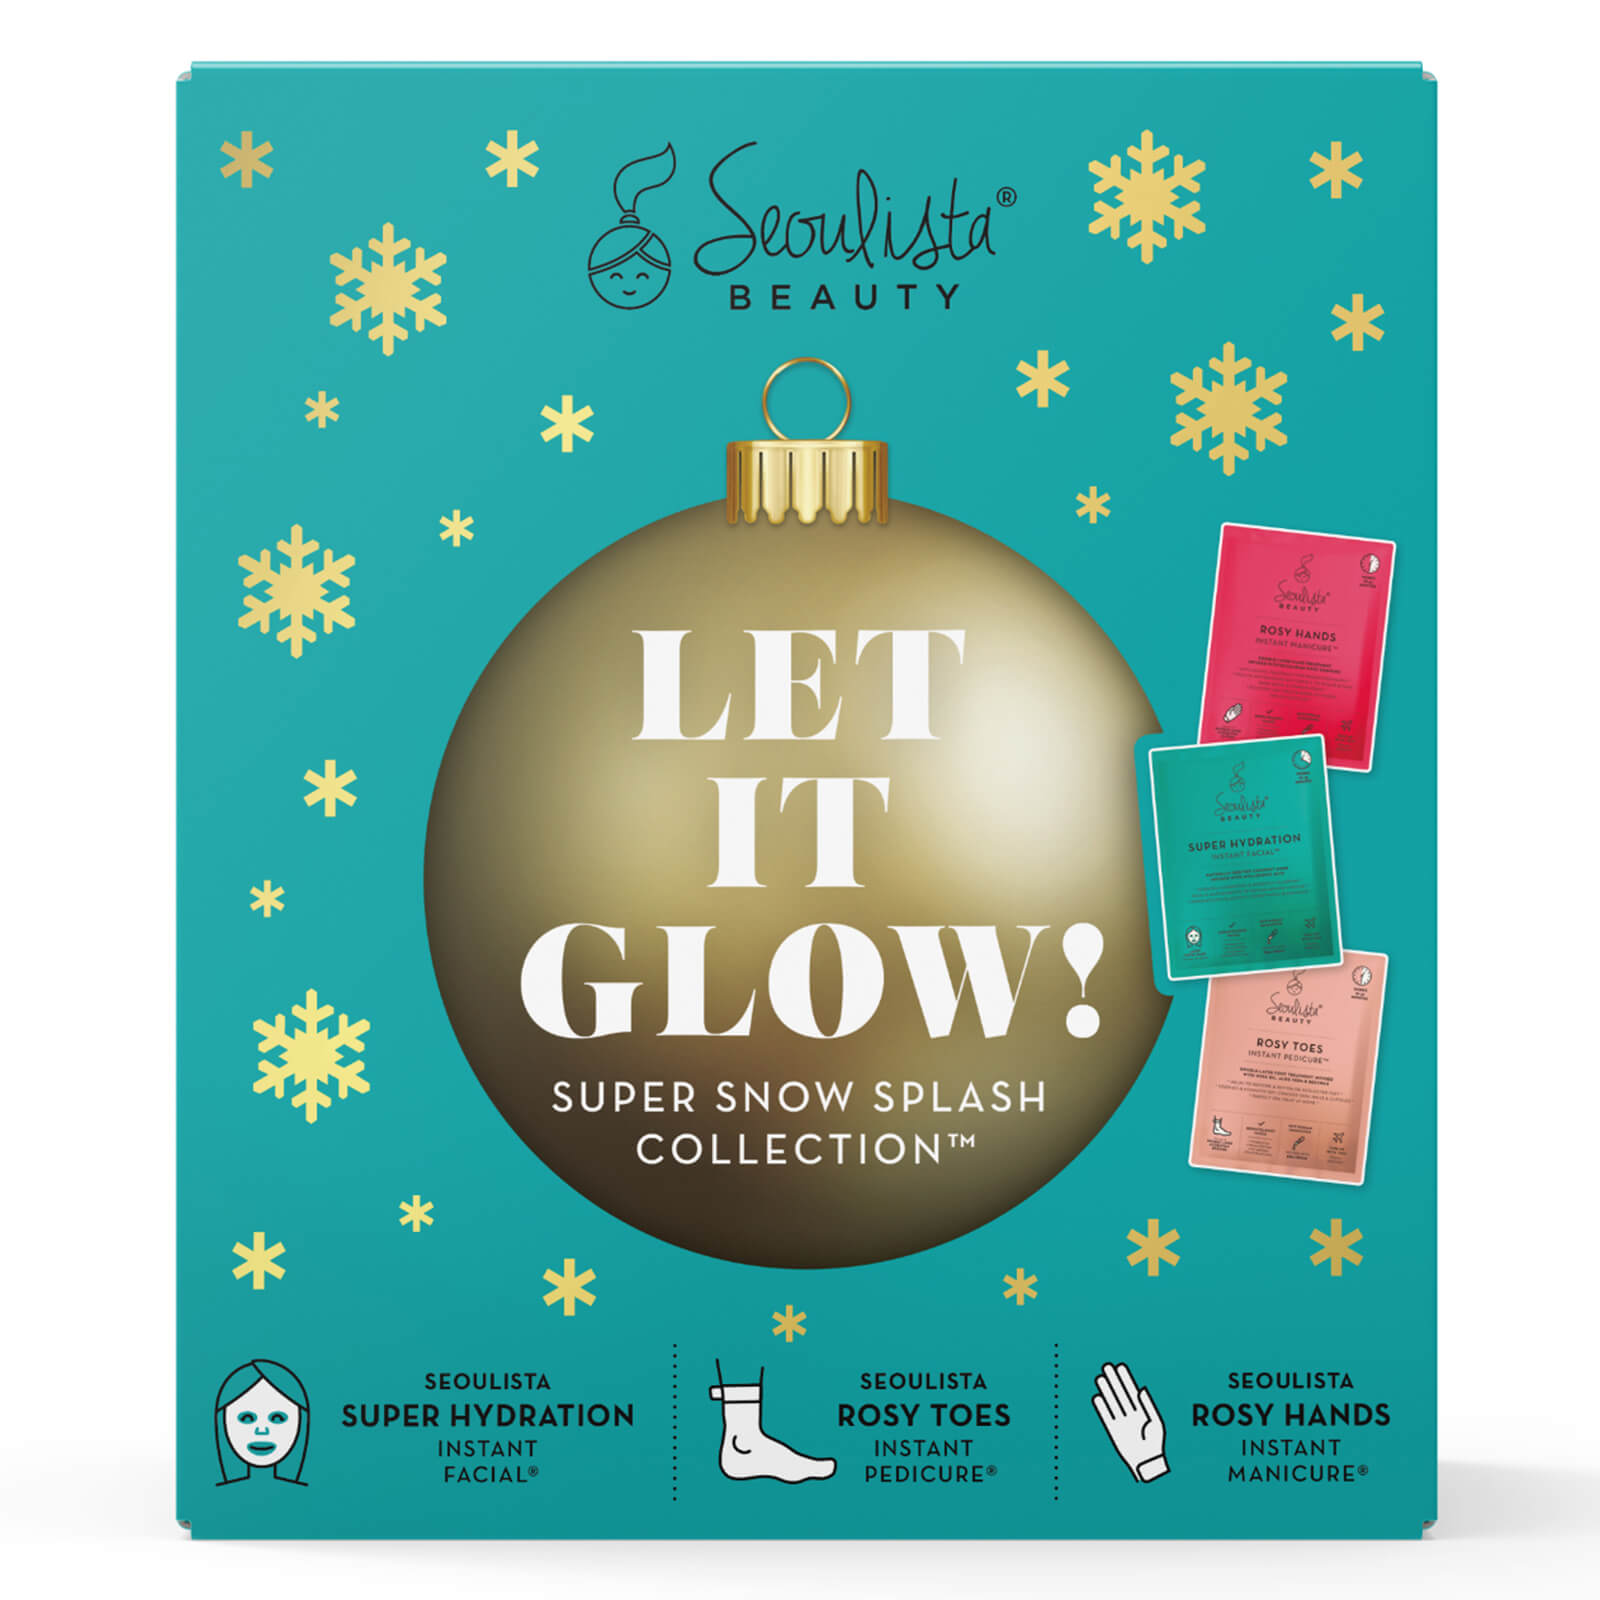 Купить Seoulista Beauty Christmas Pack - Let it Glow! Super Snow Splash Collection